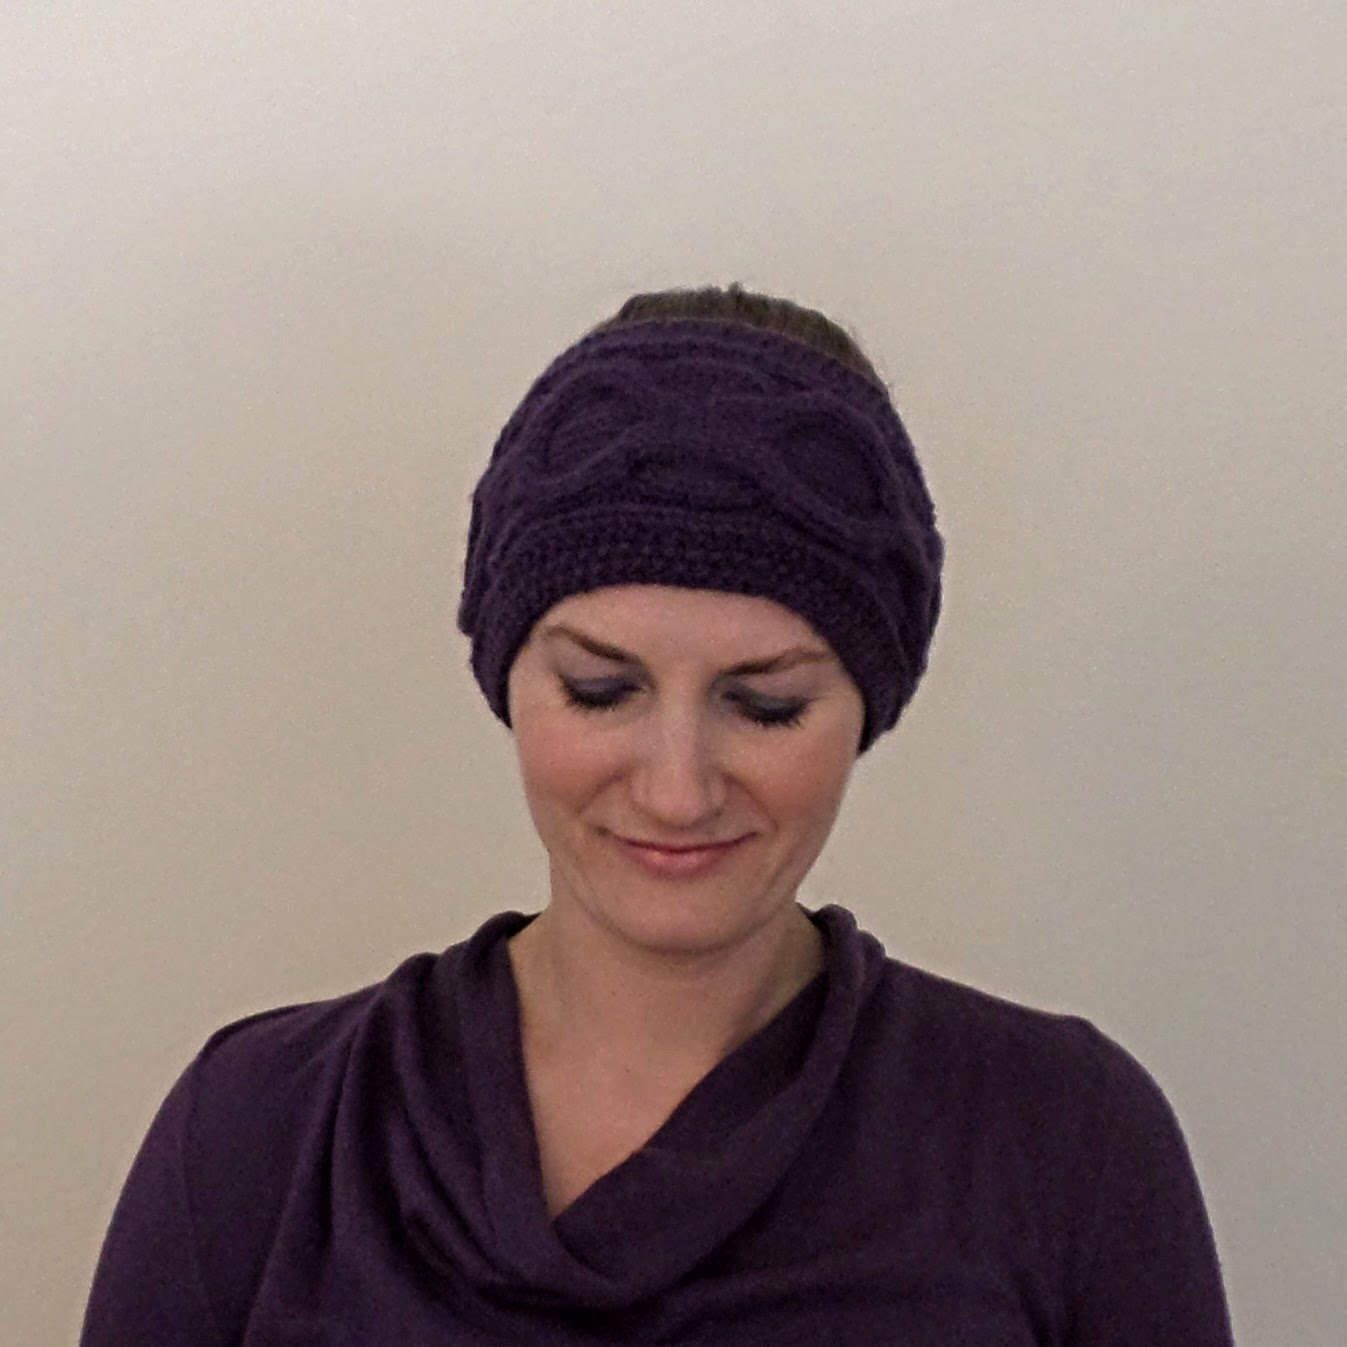 Ear Warmer, Cable Knit Headband, Ear Warmer Bands, Knitted Ear ...